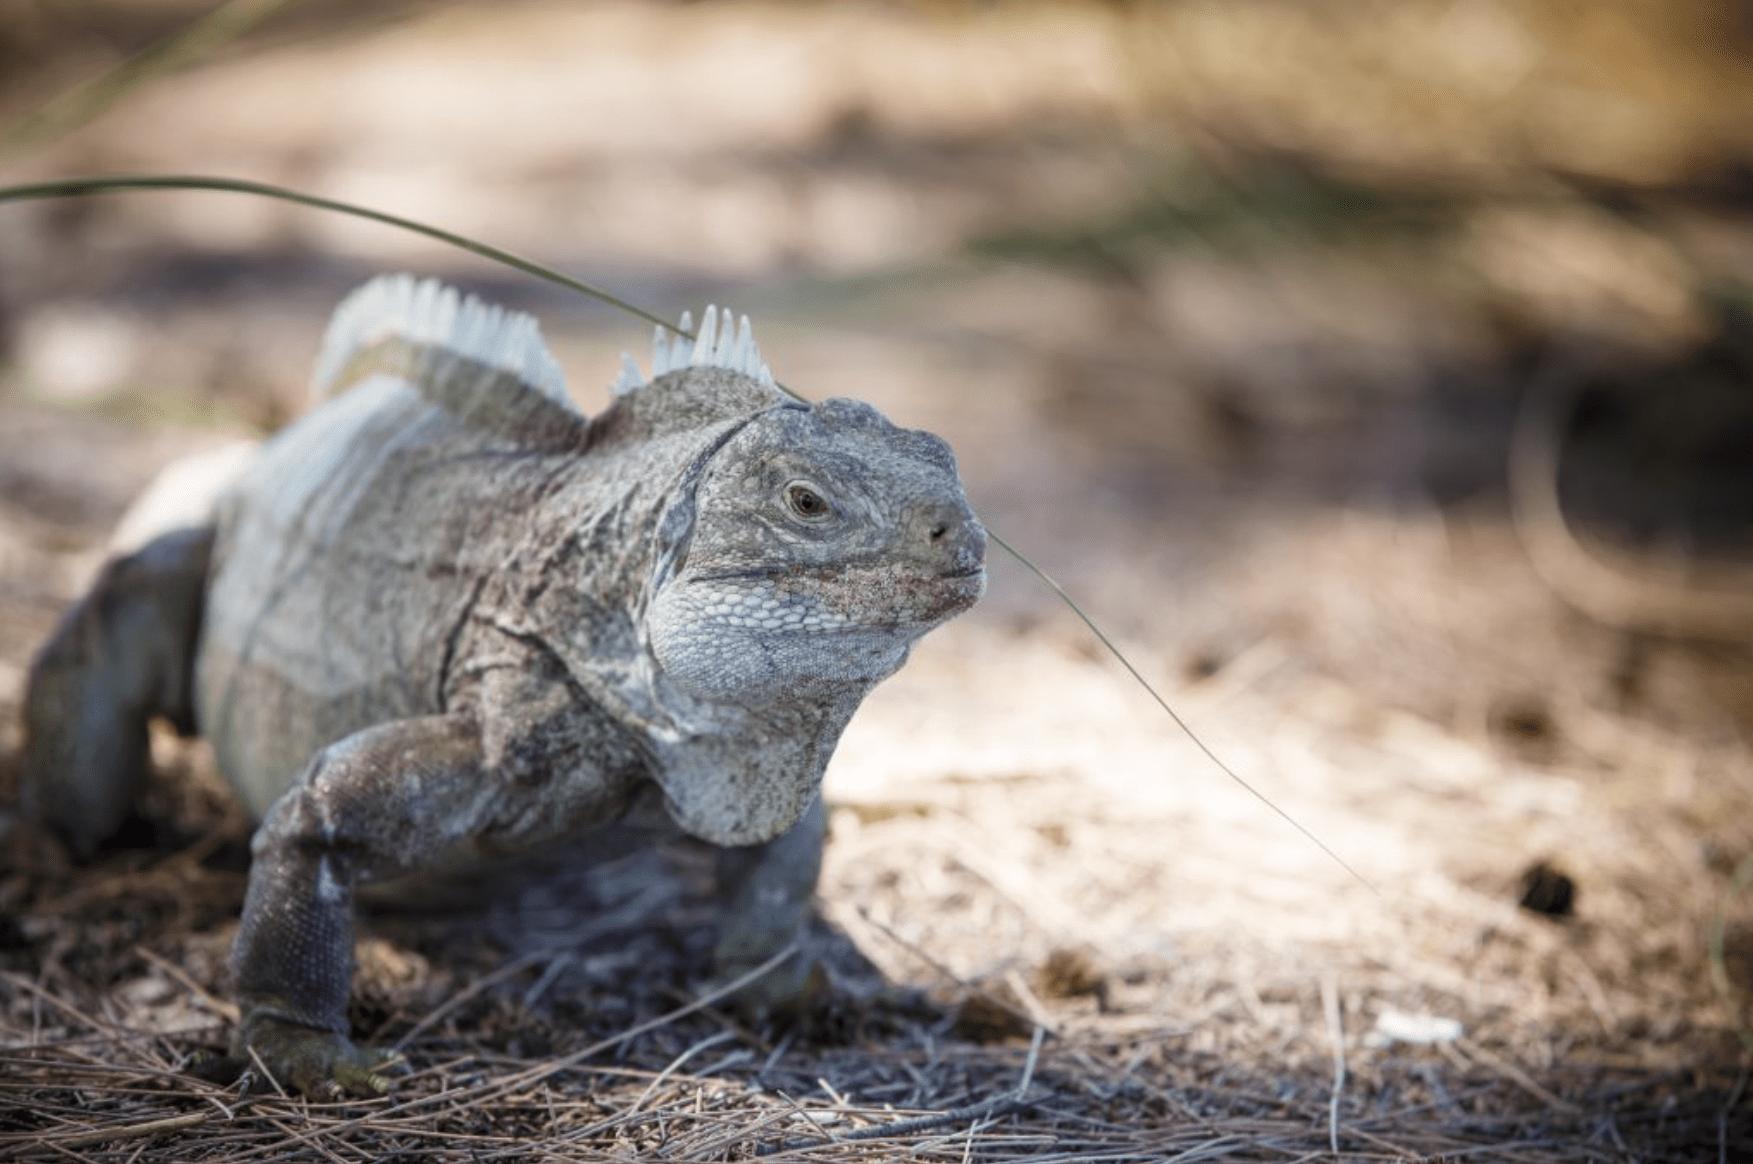 iguana in its natural habitat on iguana island turks and caicos